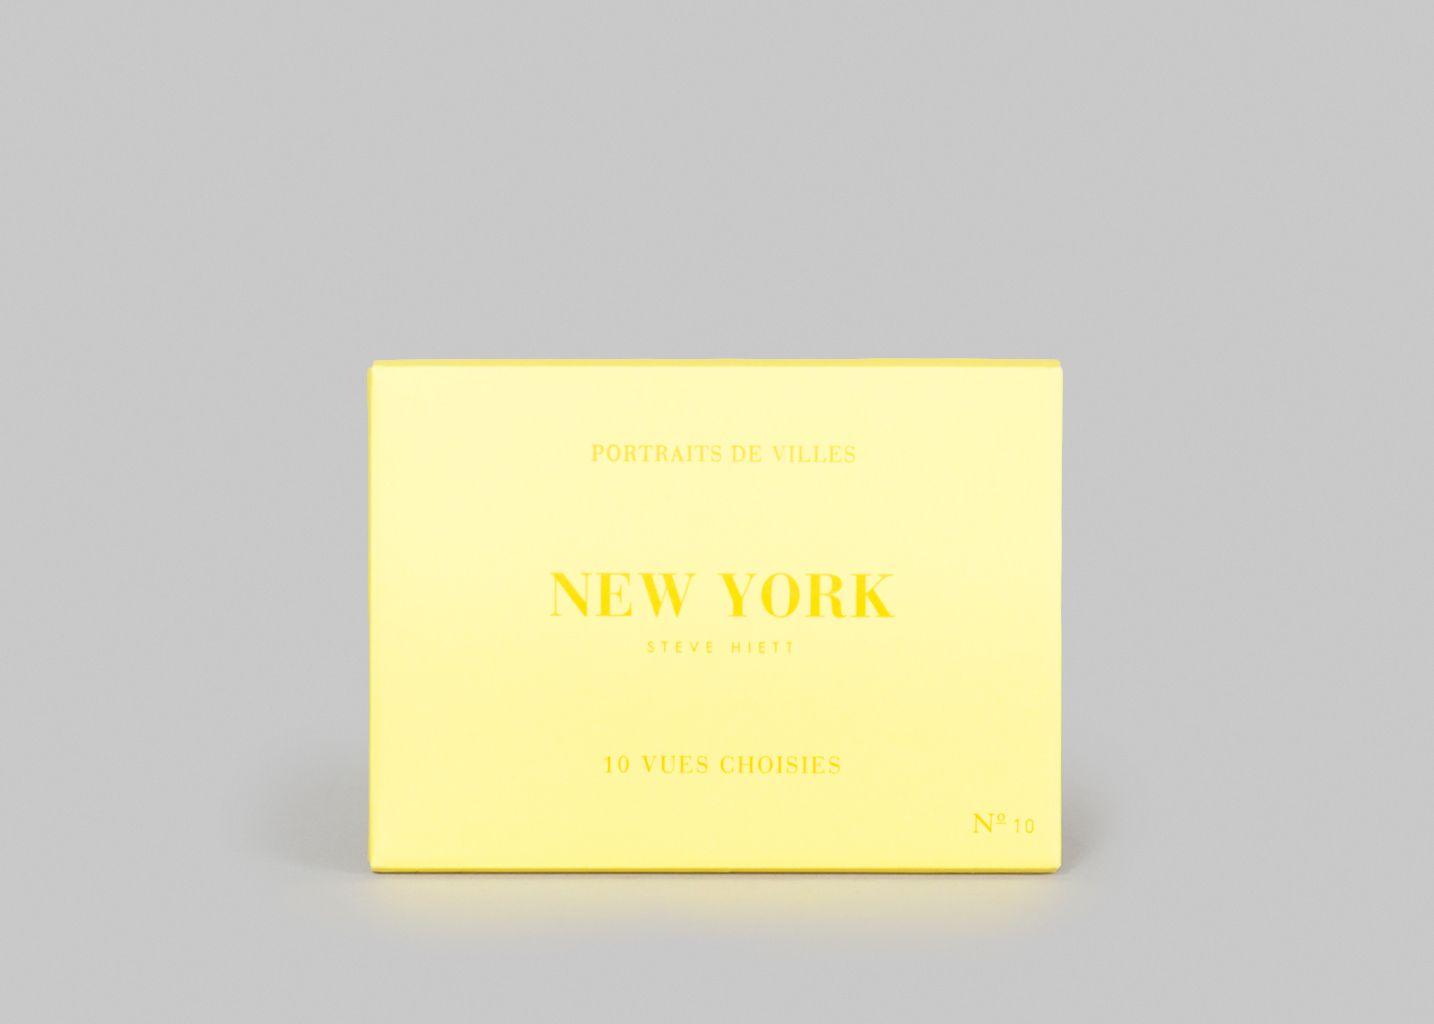 Vues Choisies New York - be-poles